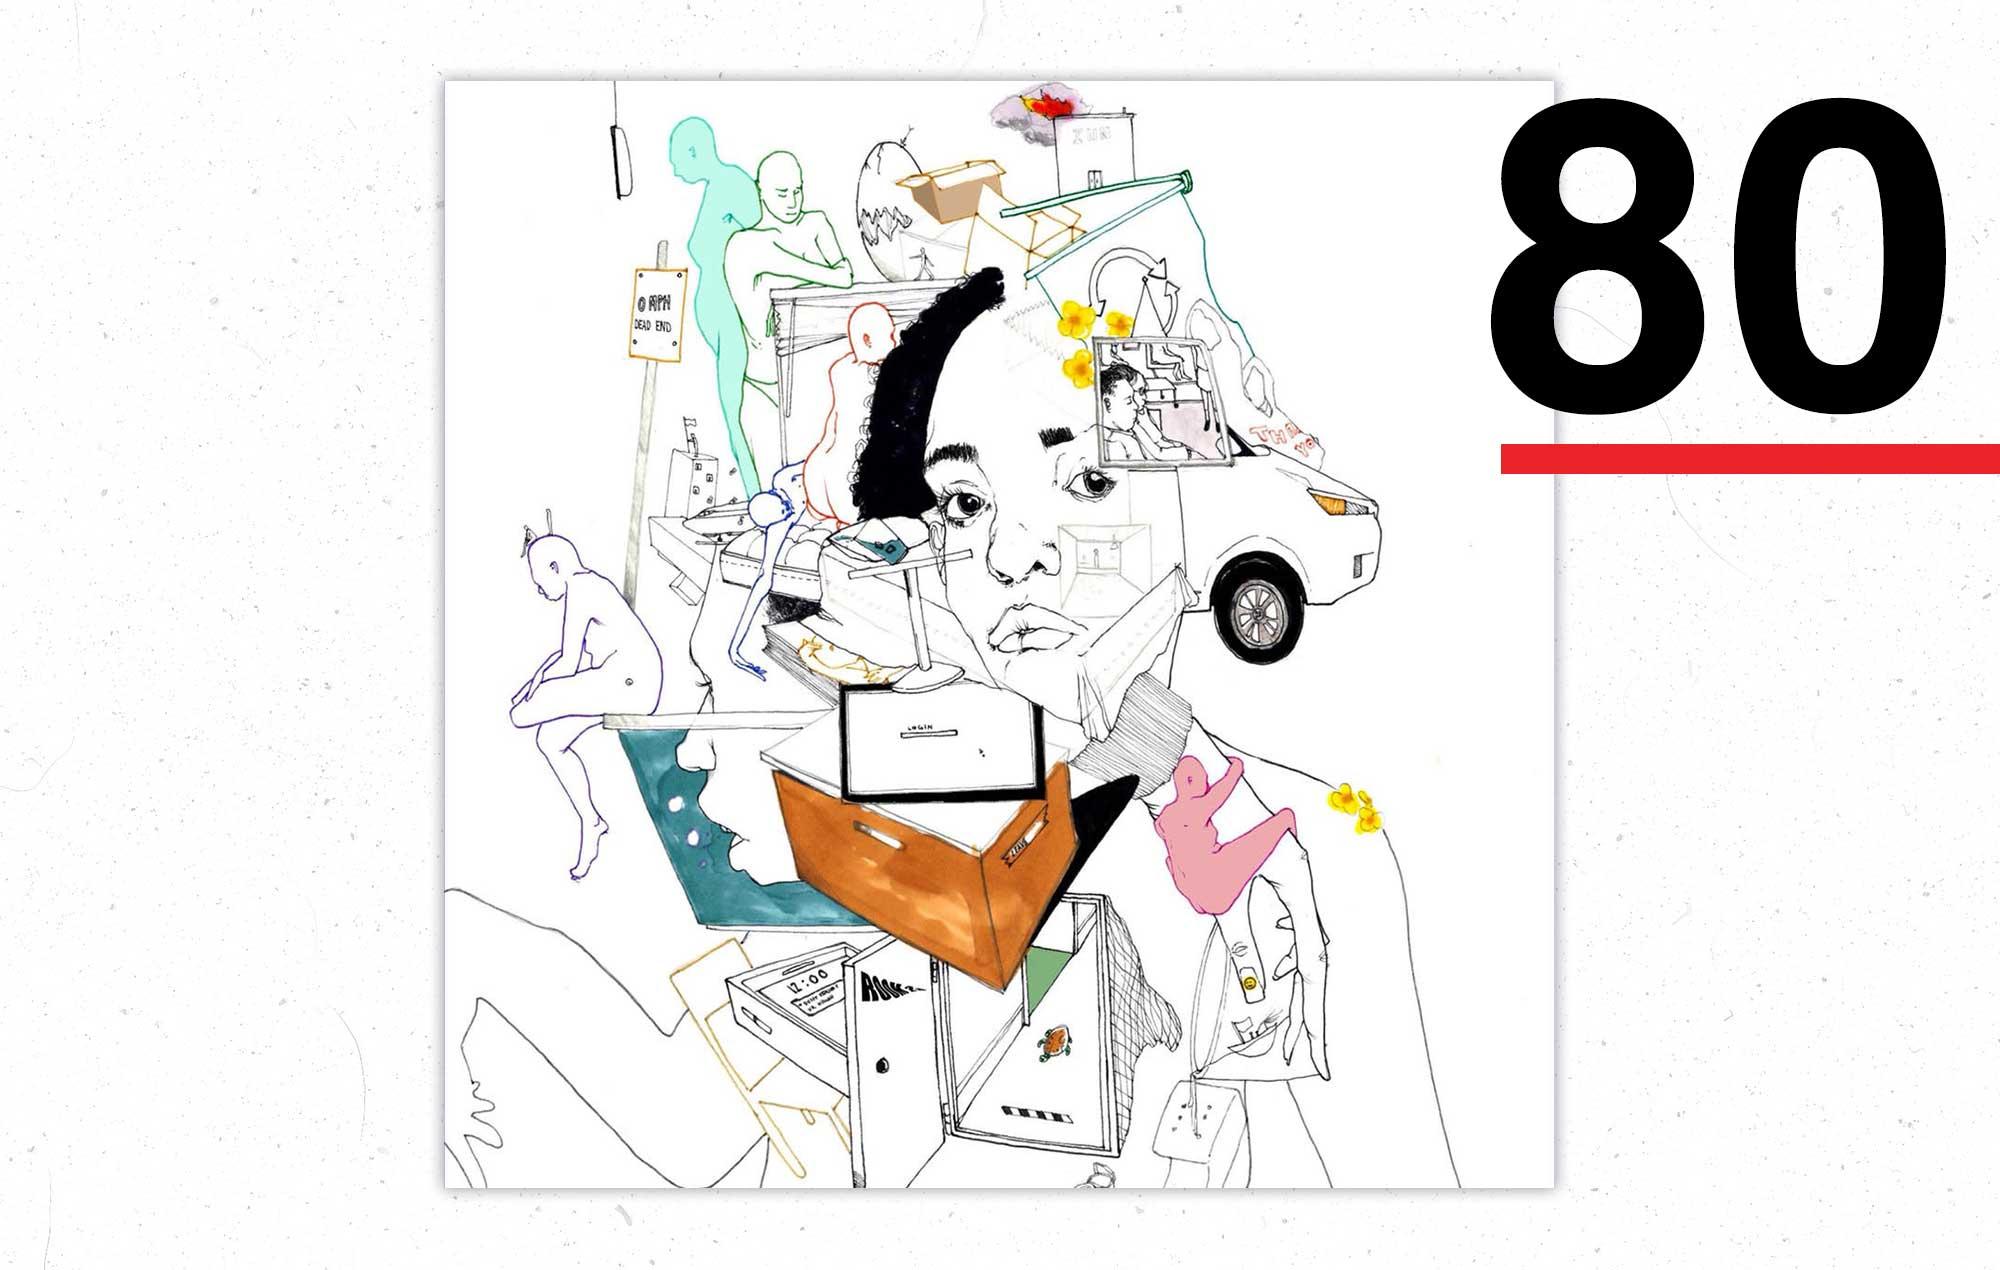 Noname | Best albums 2018